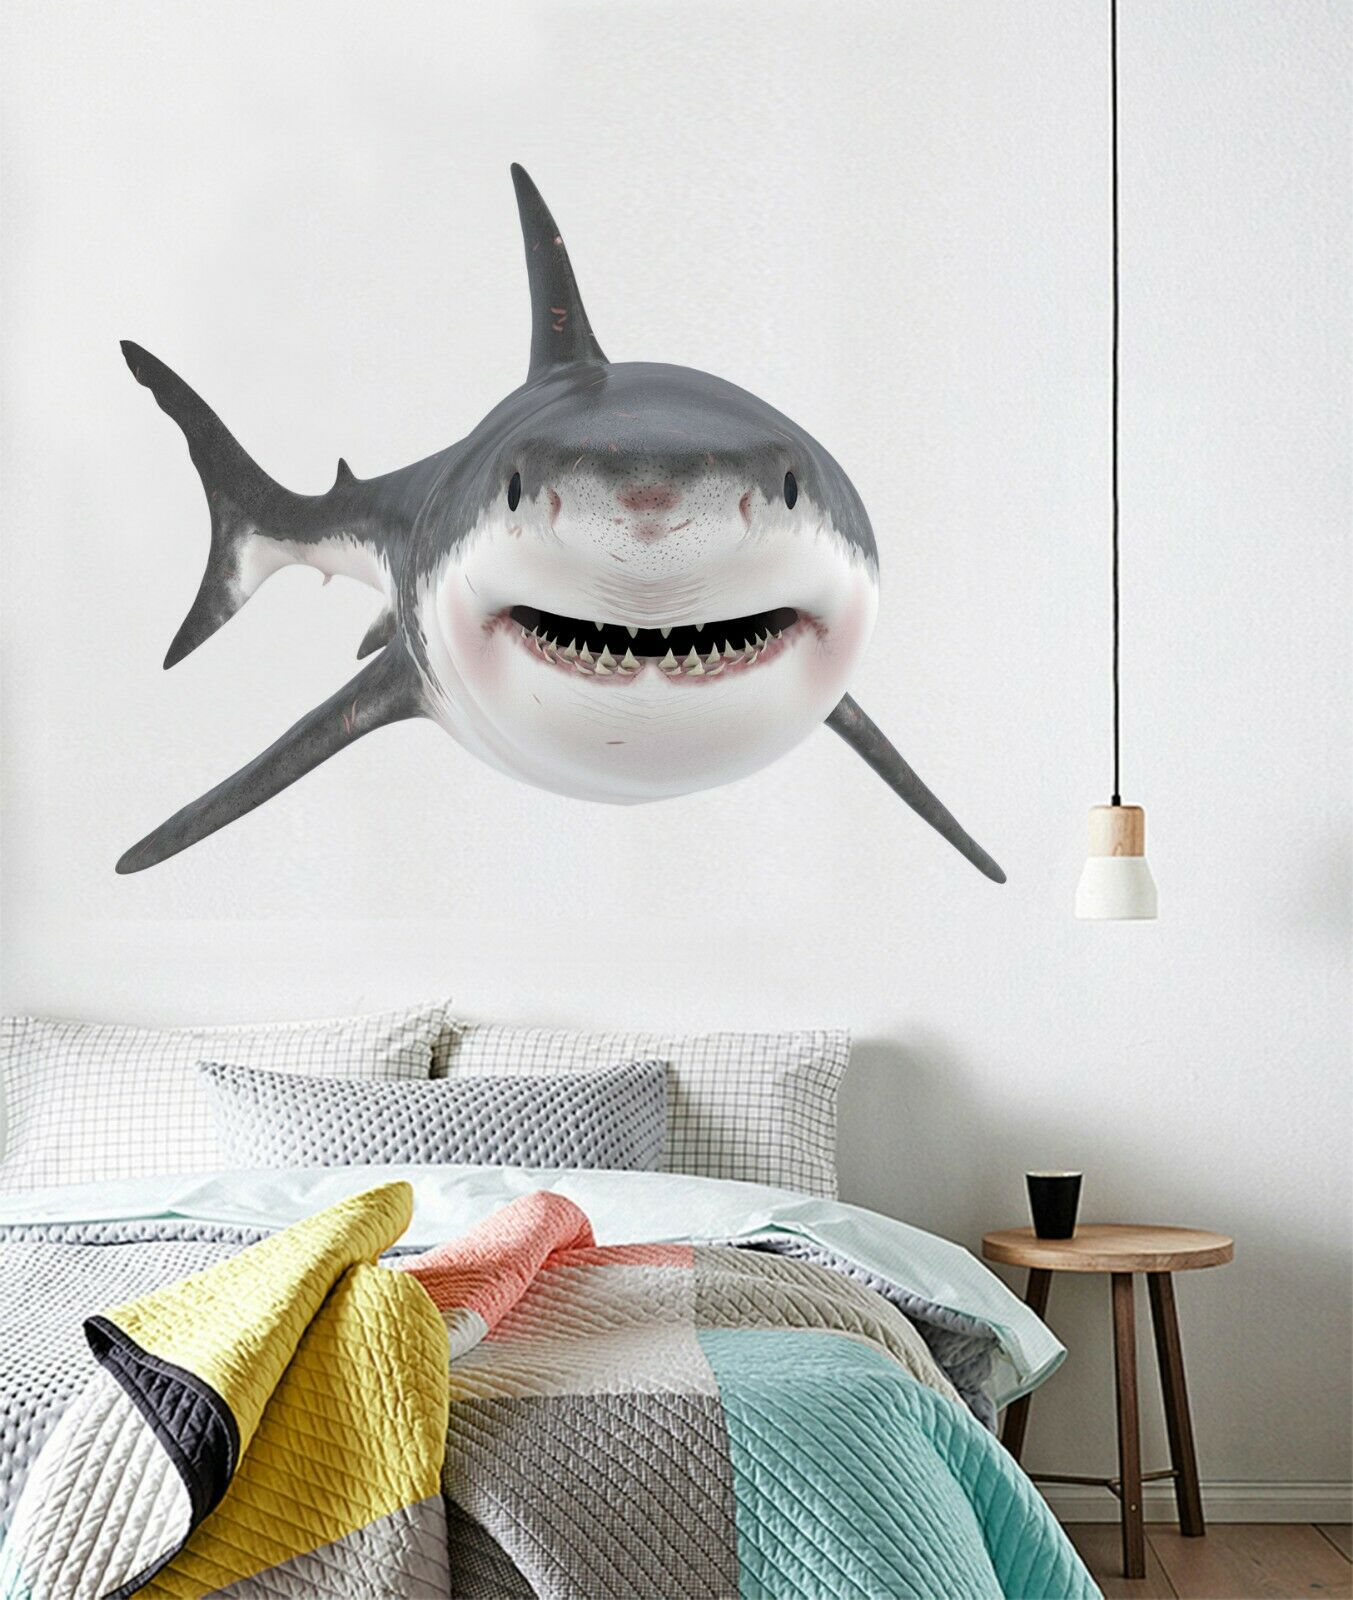 3D Smiling Shark P39 Animal Wallpaper Mural Self-adhesive Removable Zoe